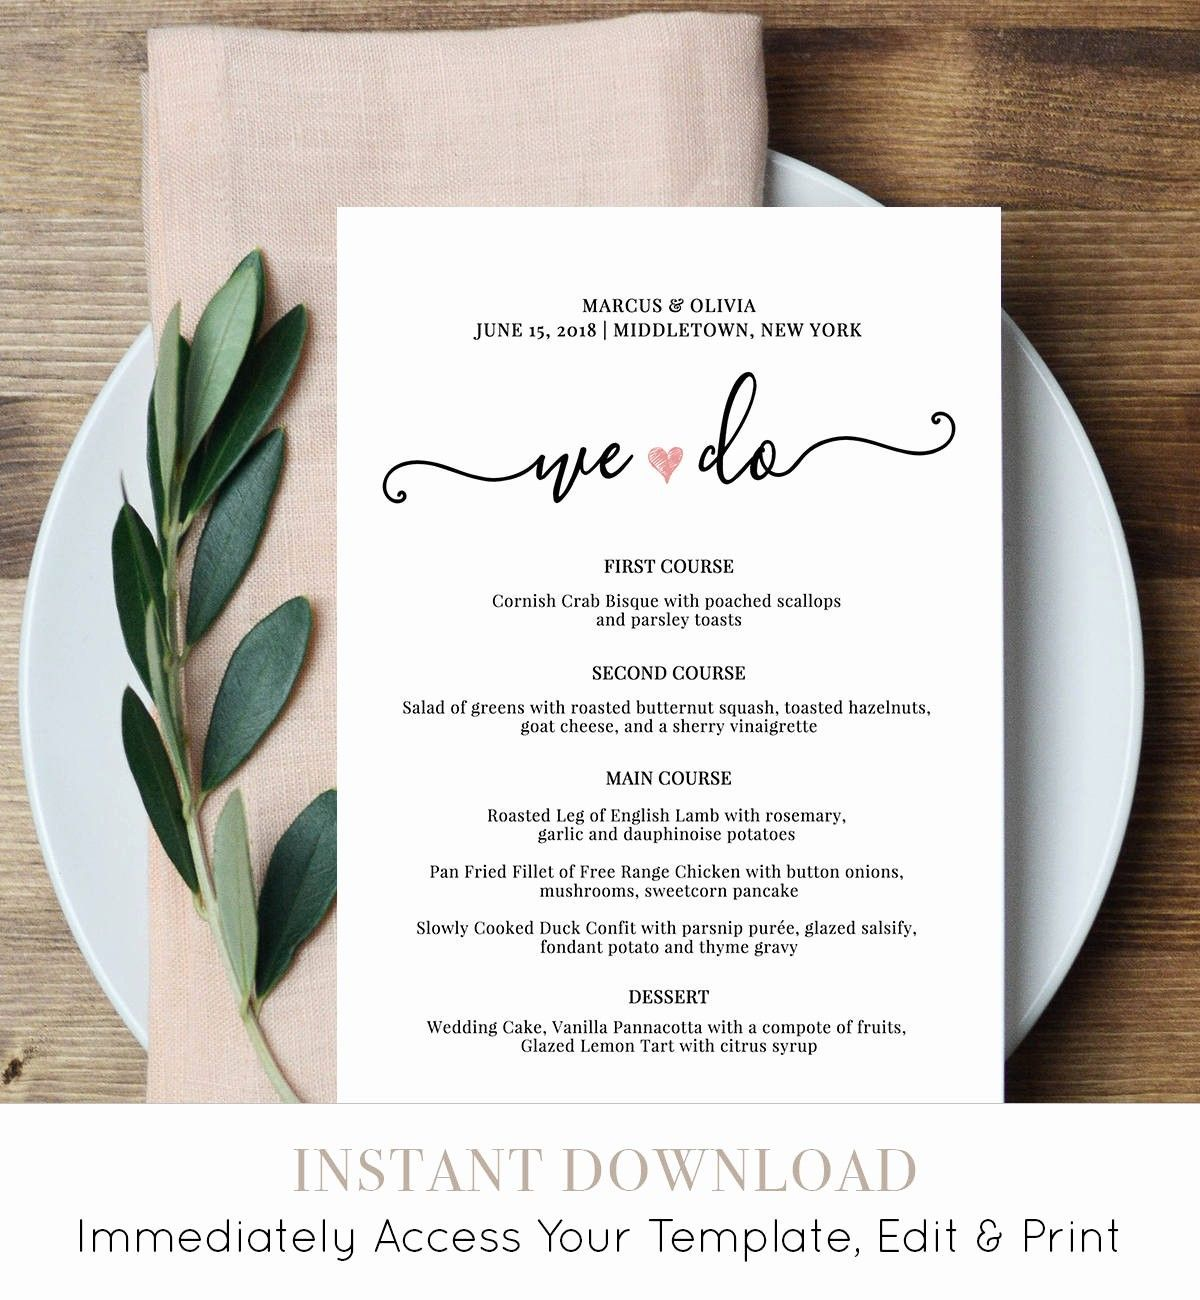 001 Surprising Menu Card Template Free Download Example  Indian Restaurant Design CafeFull